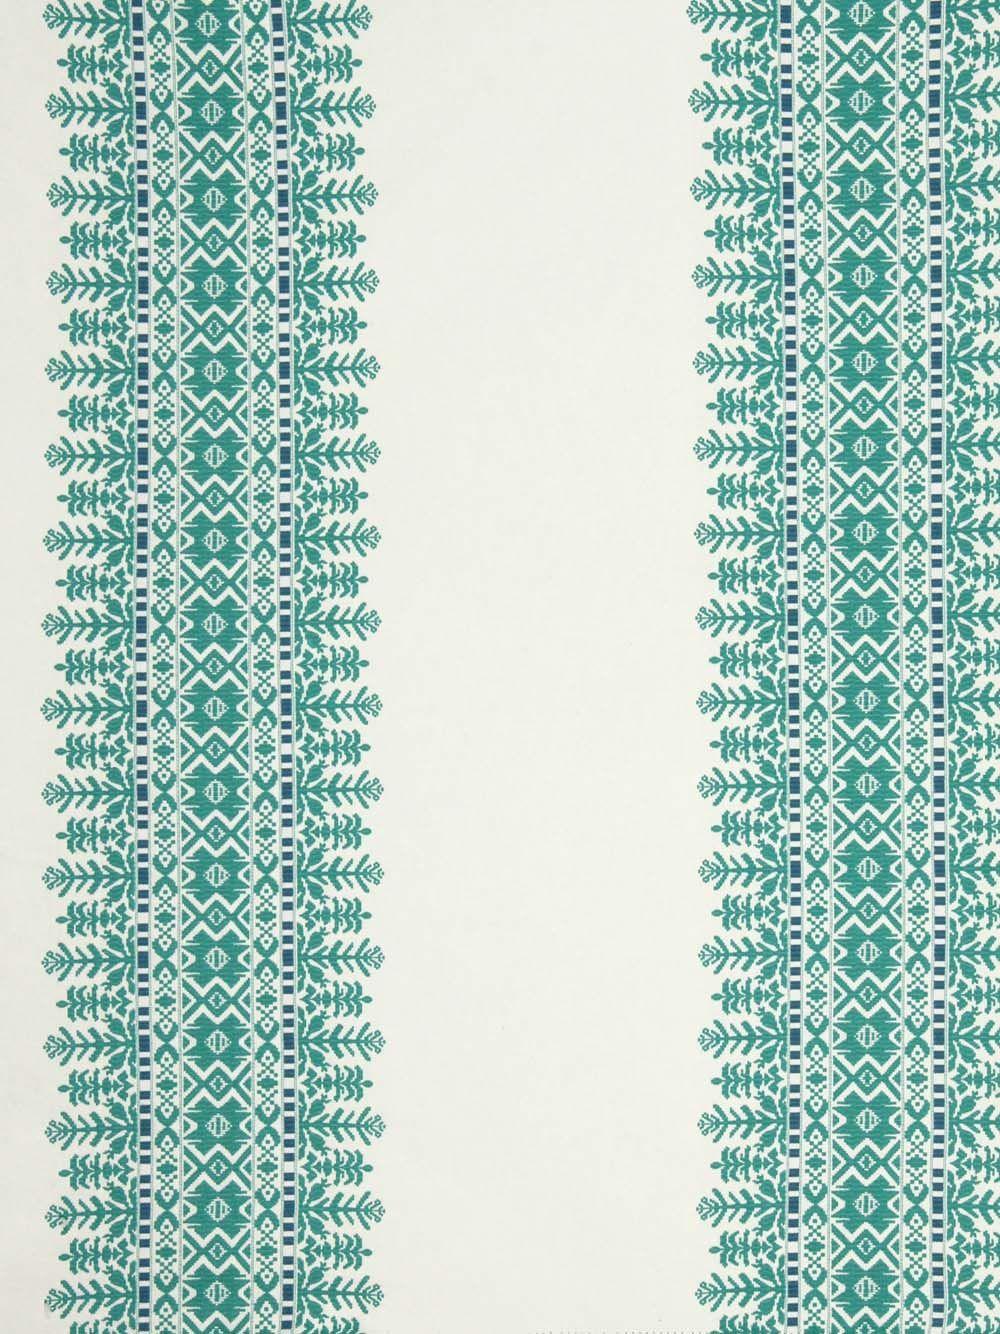 Pin by Maria Velasquez on Prints I Love   Pinterest   Dibujos para ...